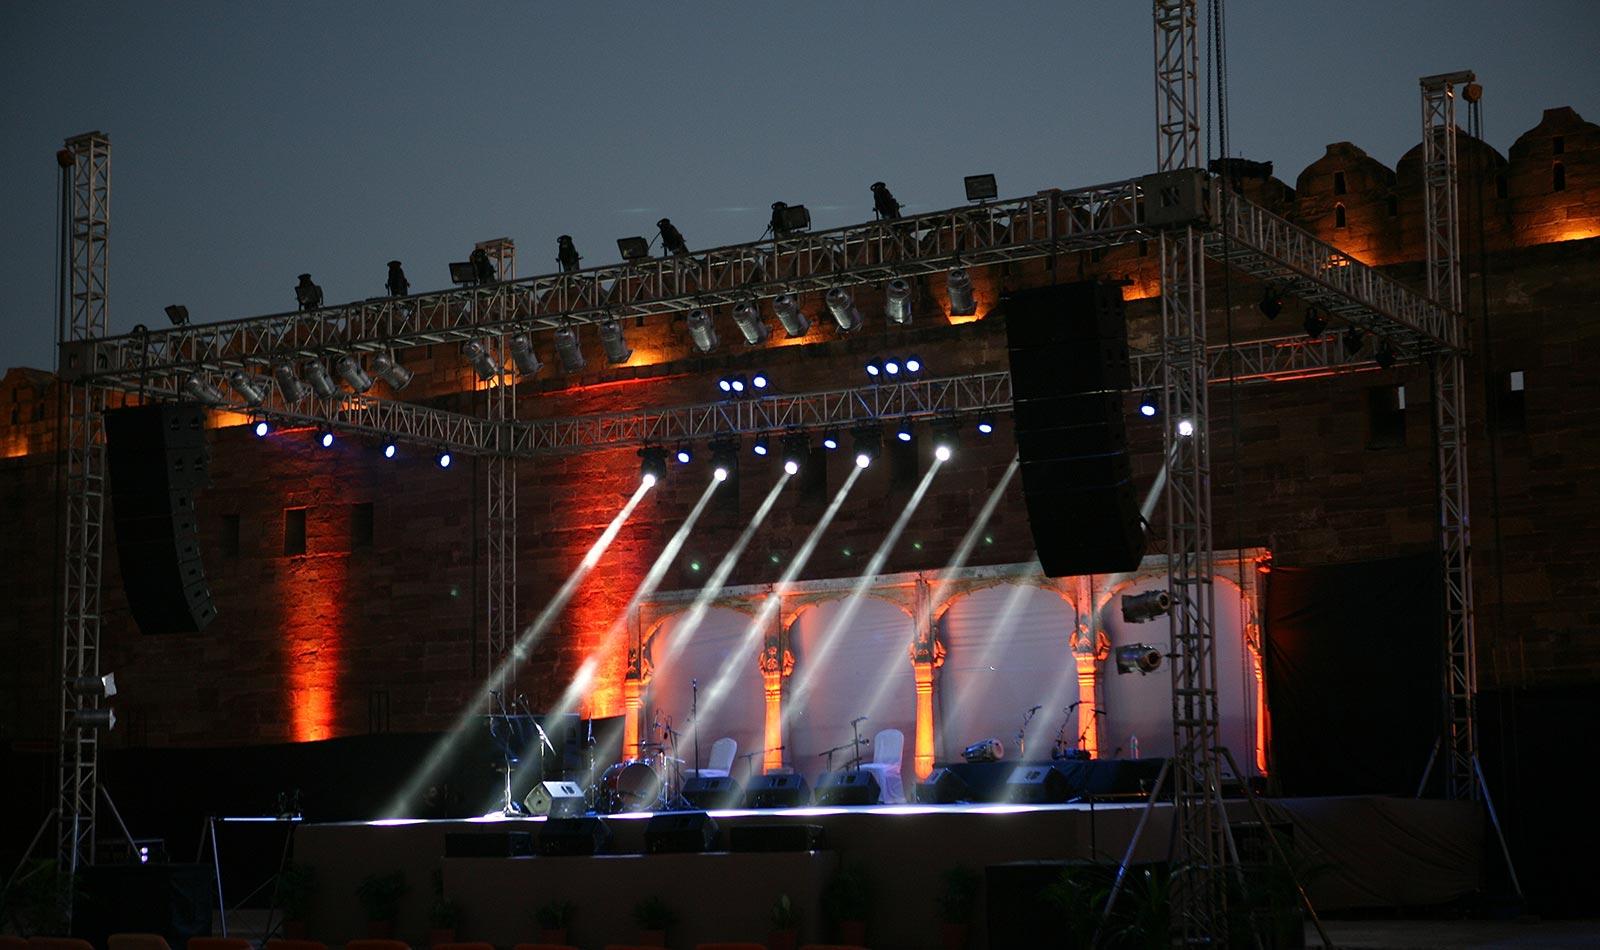 JFG Festival 2014